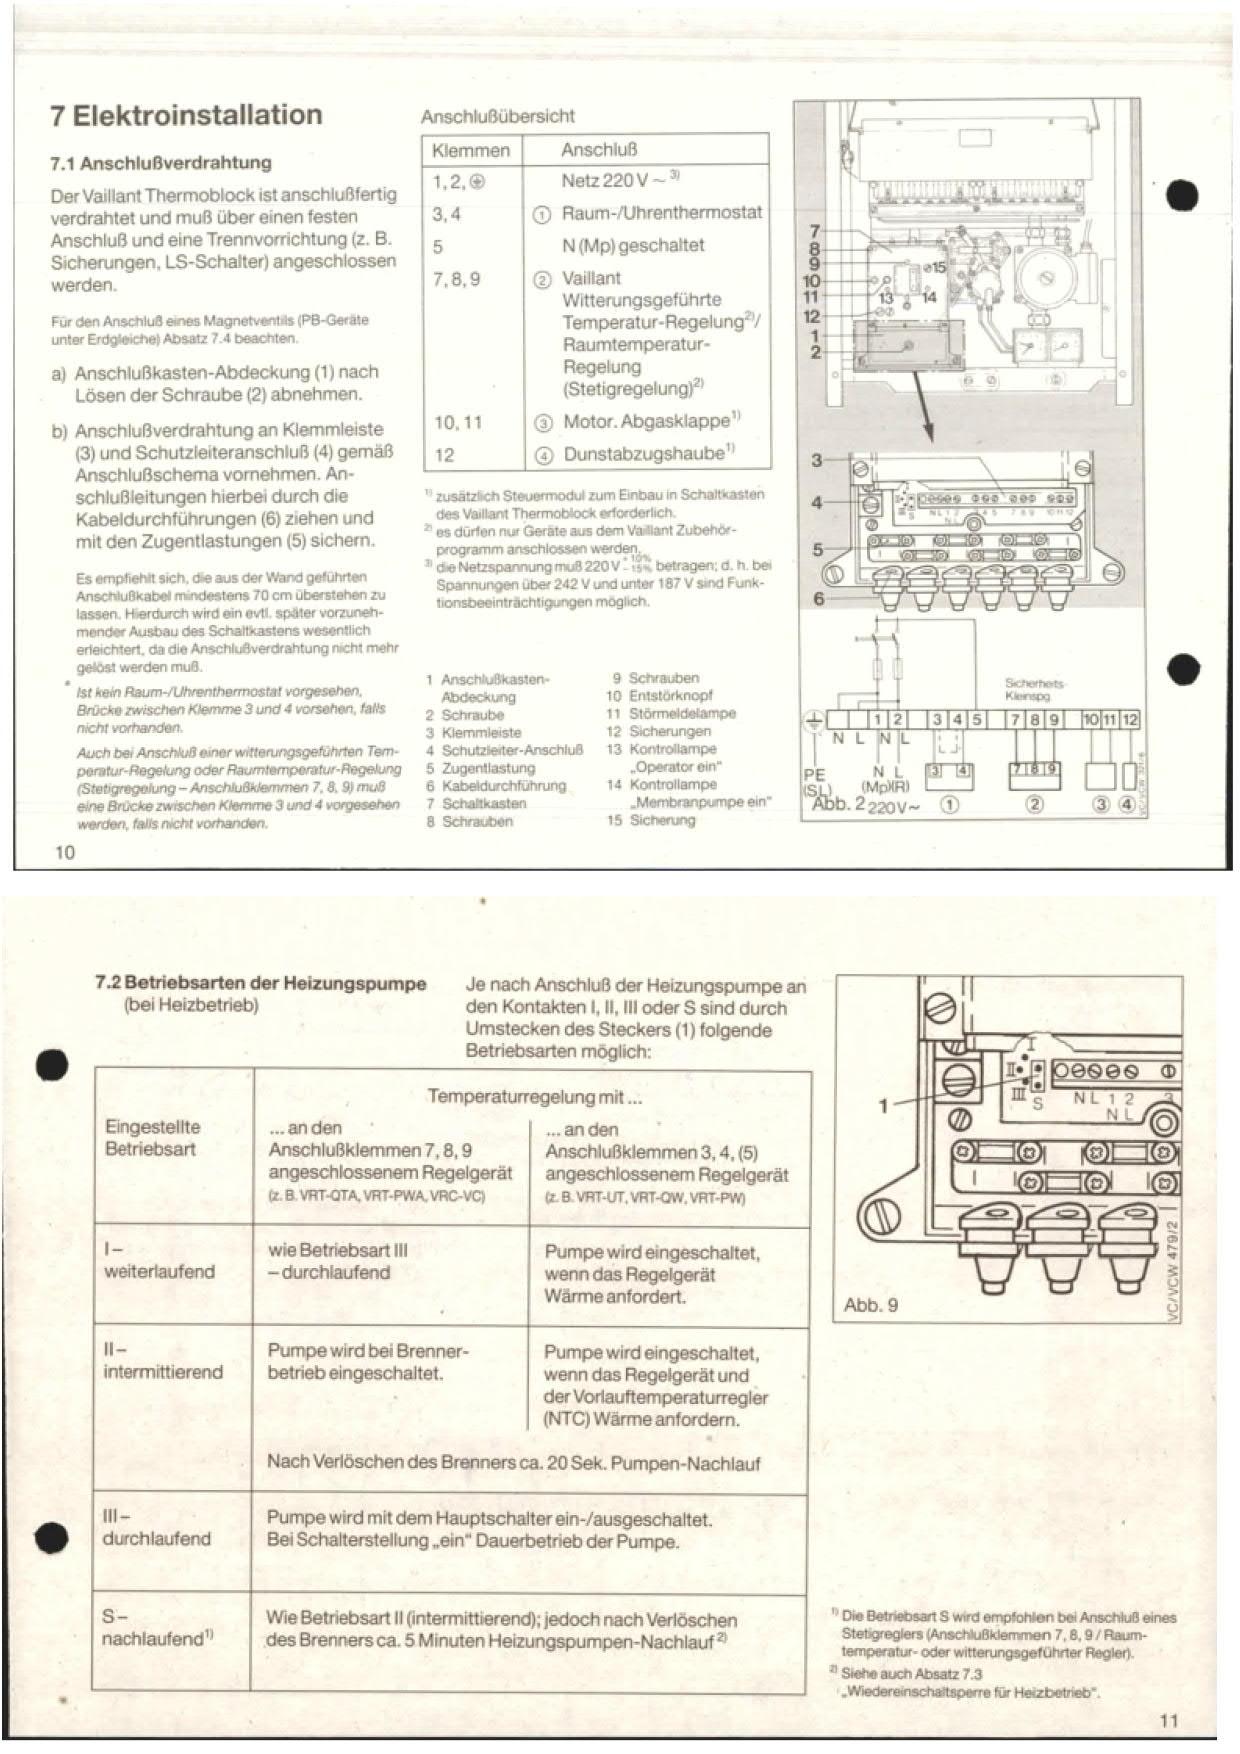 Heizungsschnittstelle 7-8-9 - Mikrocontroller.net